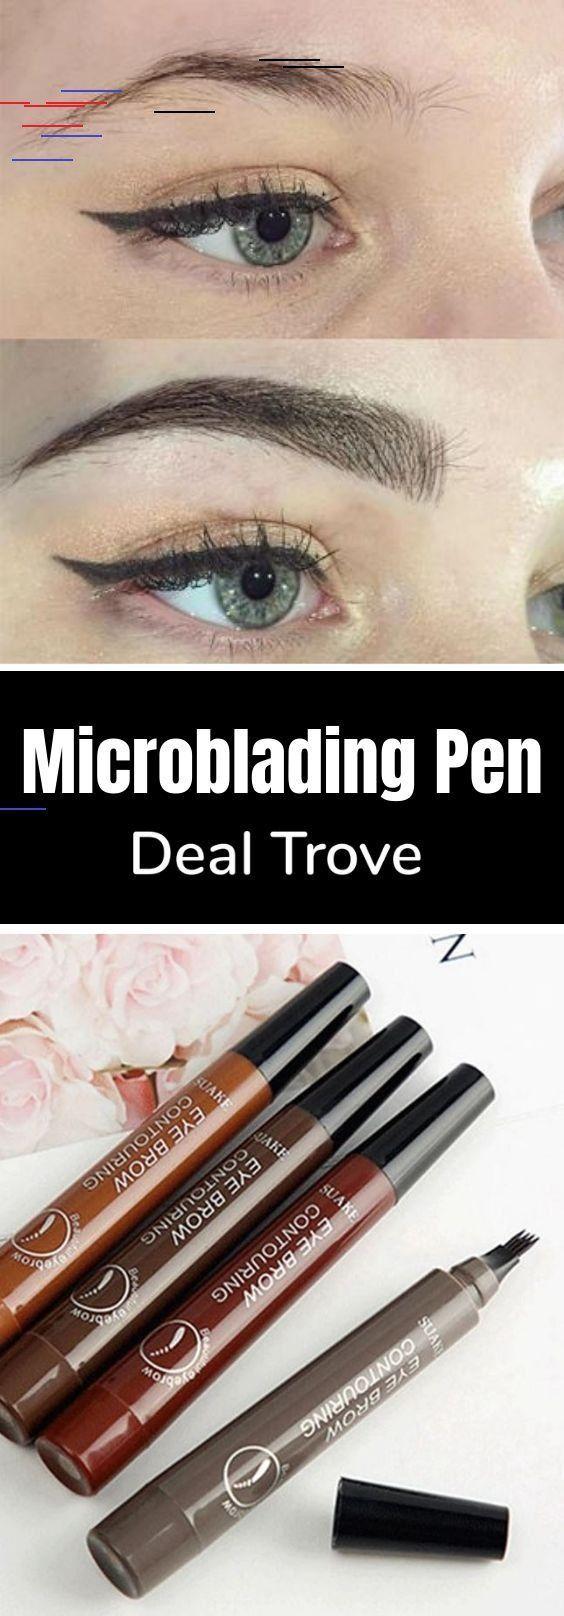 Waterproof Microblading Eyebrow Pen ⭐⭐⭐⭐⭐ (5/5 Stars)